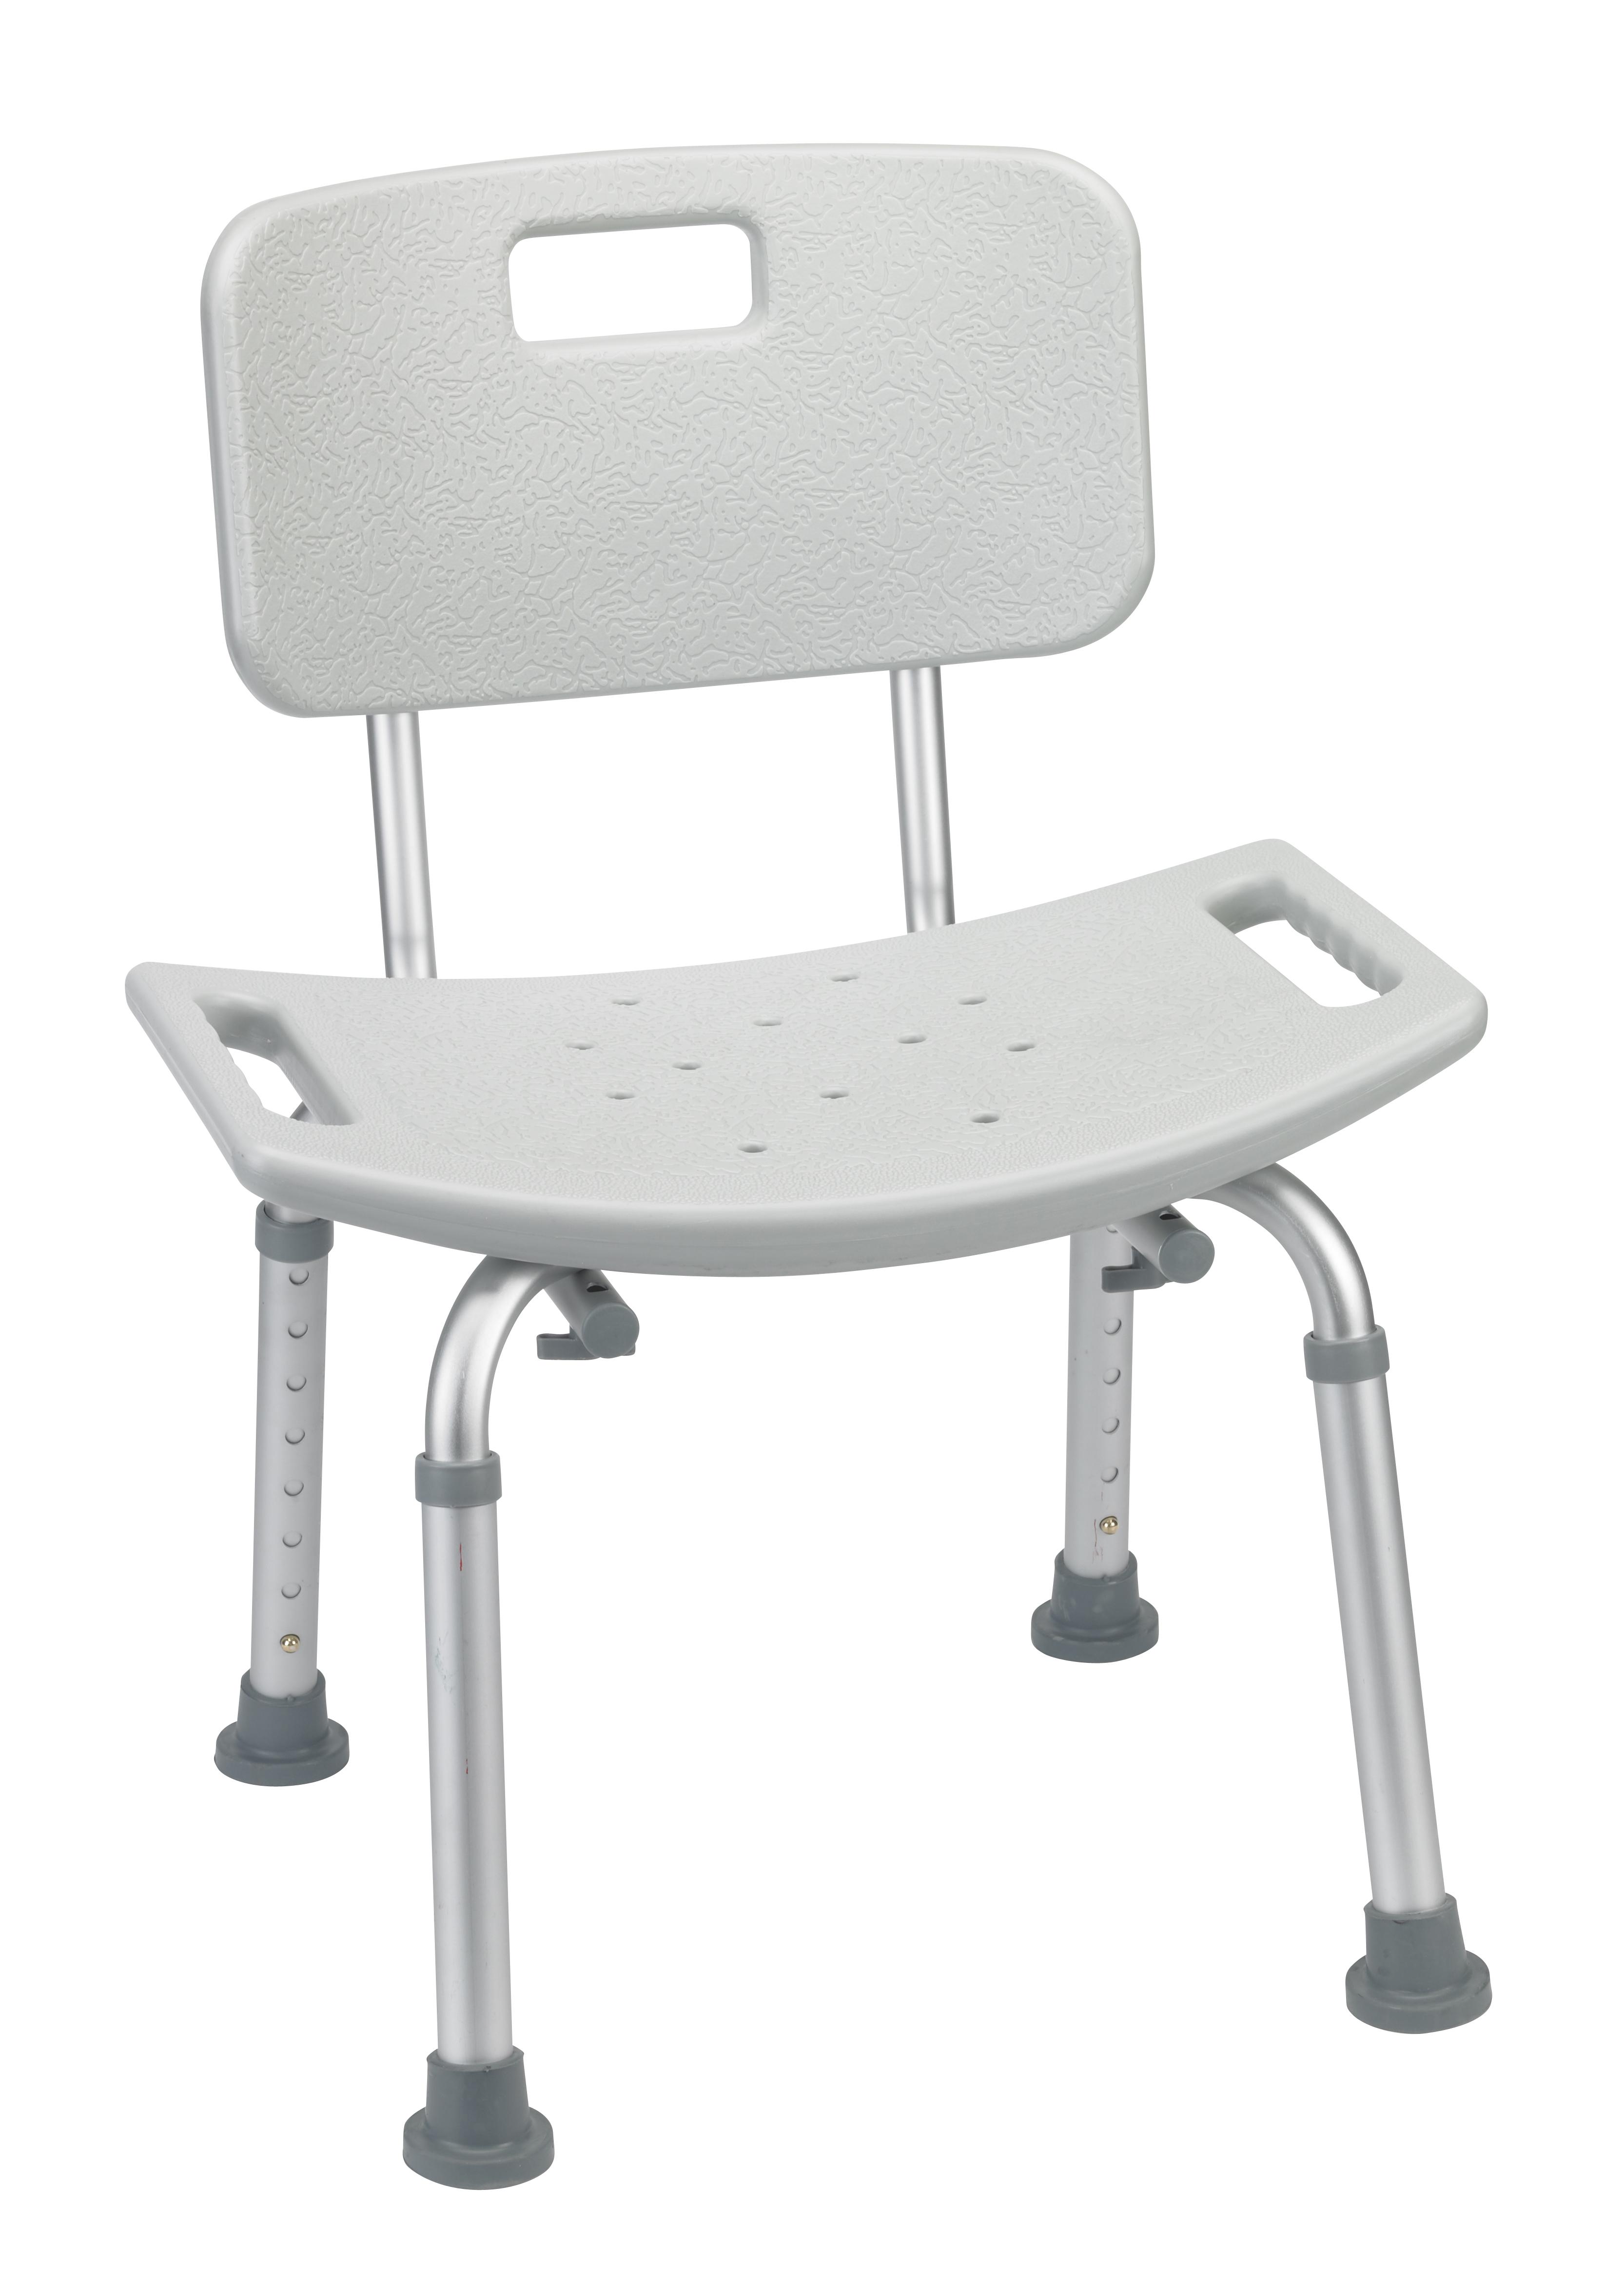 Bathroom Safety Shower Tub Bench Chair - $49.11 | OJCommerce